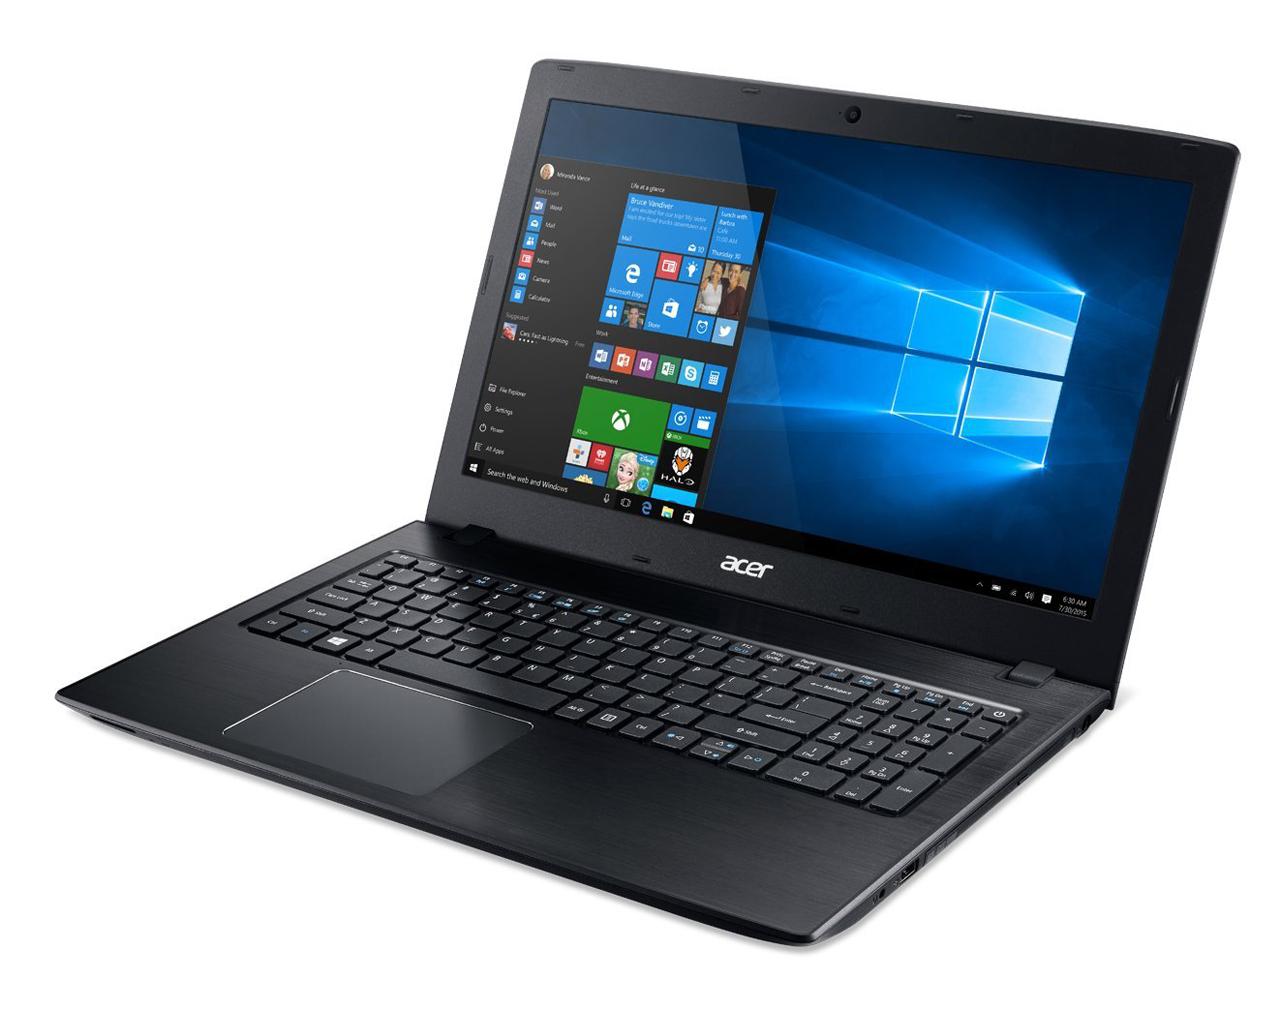 Acer Aspire E5-576-392H - Notebookcheck.net External Reviews